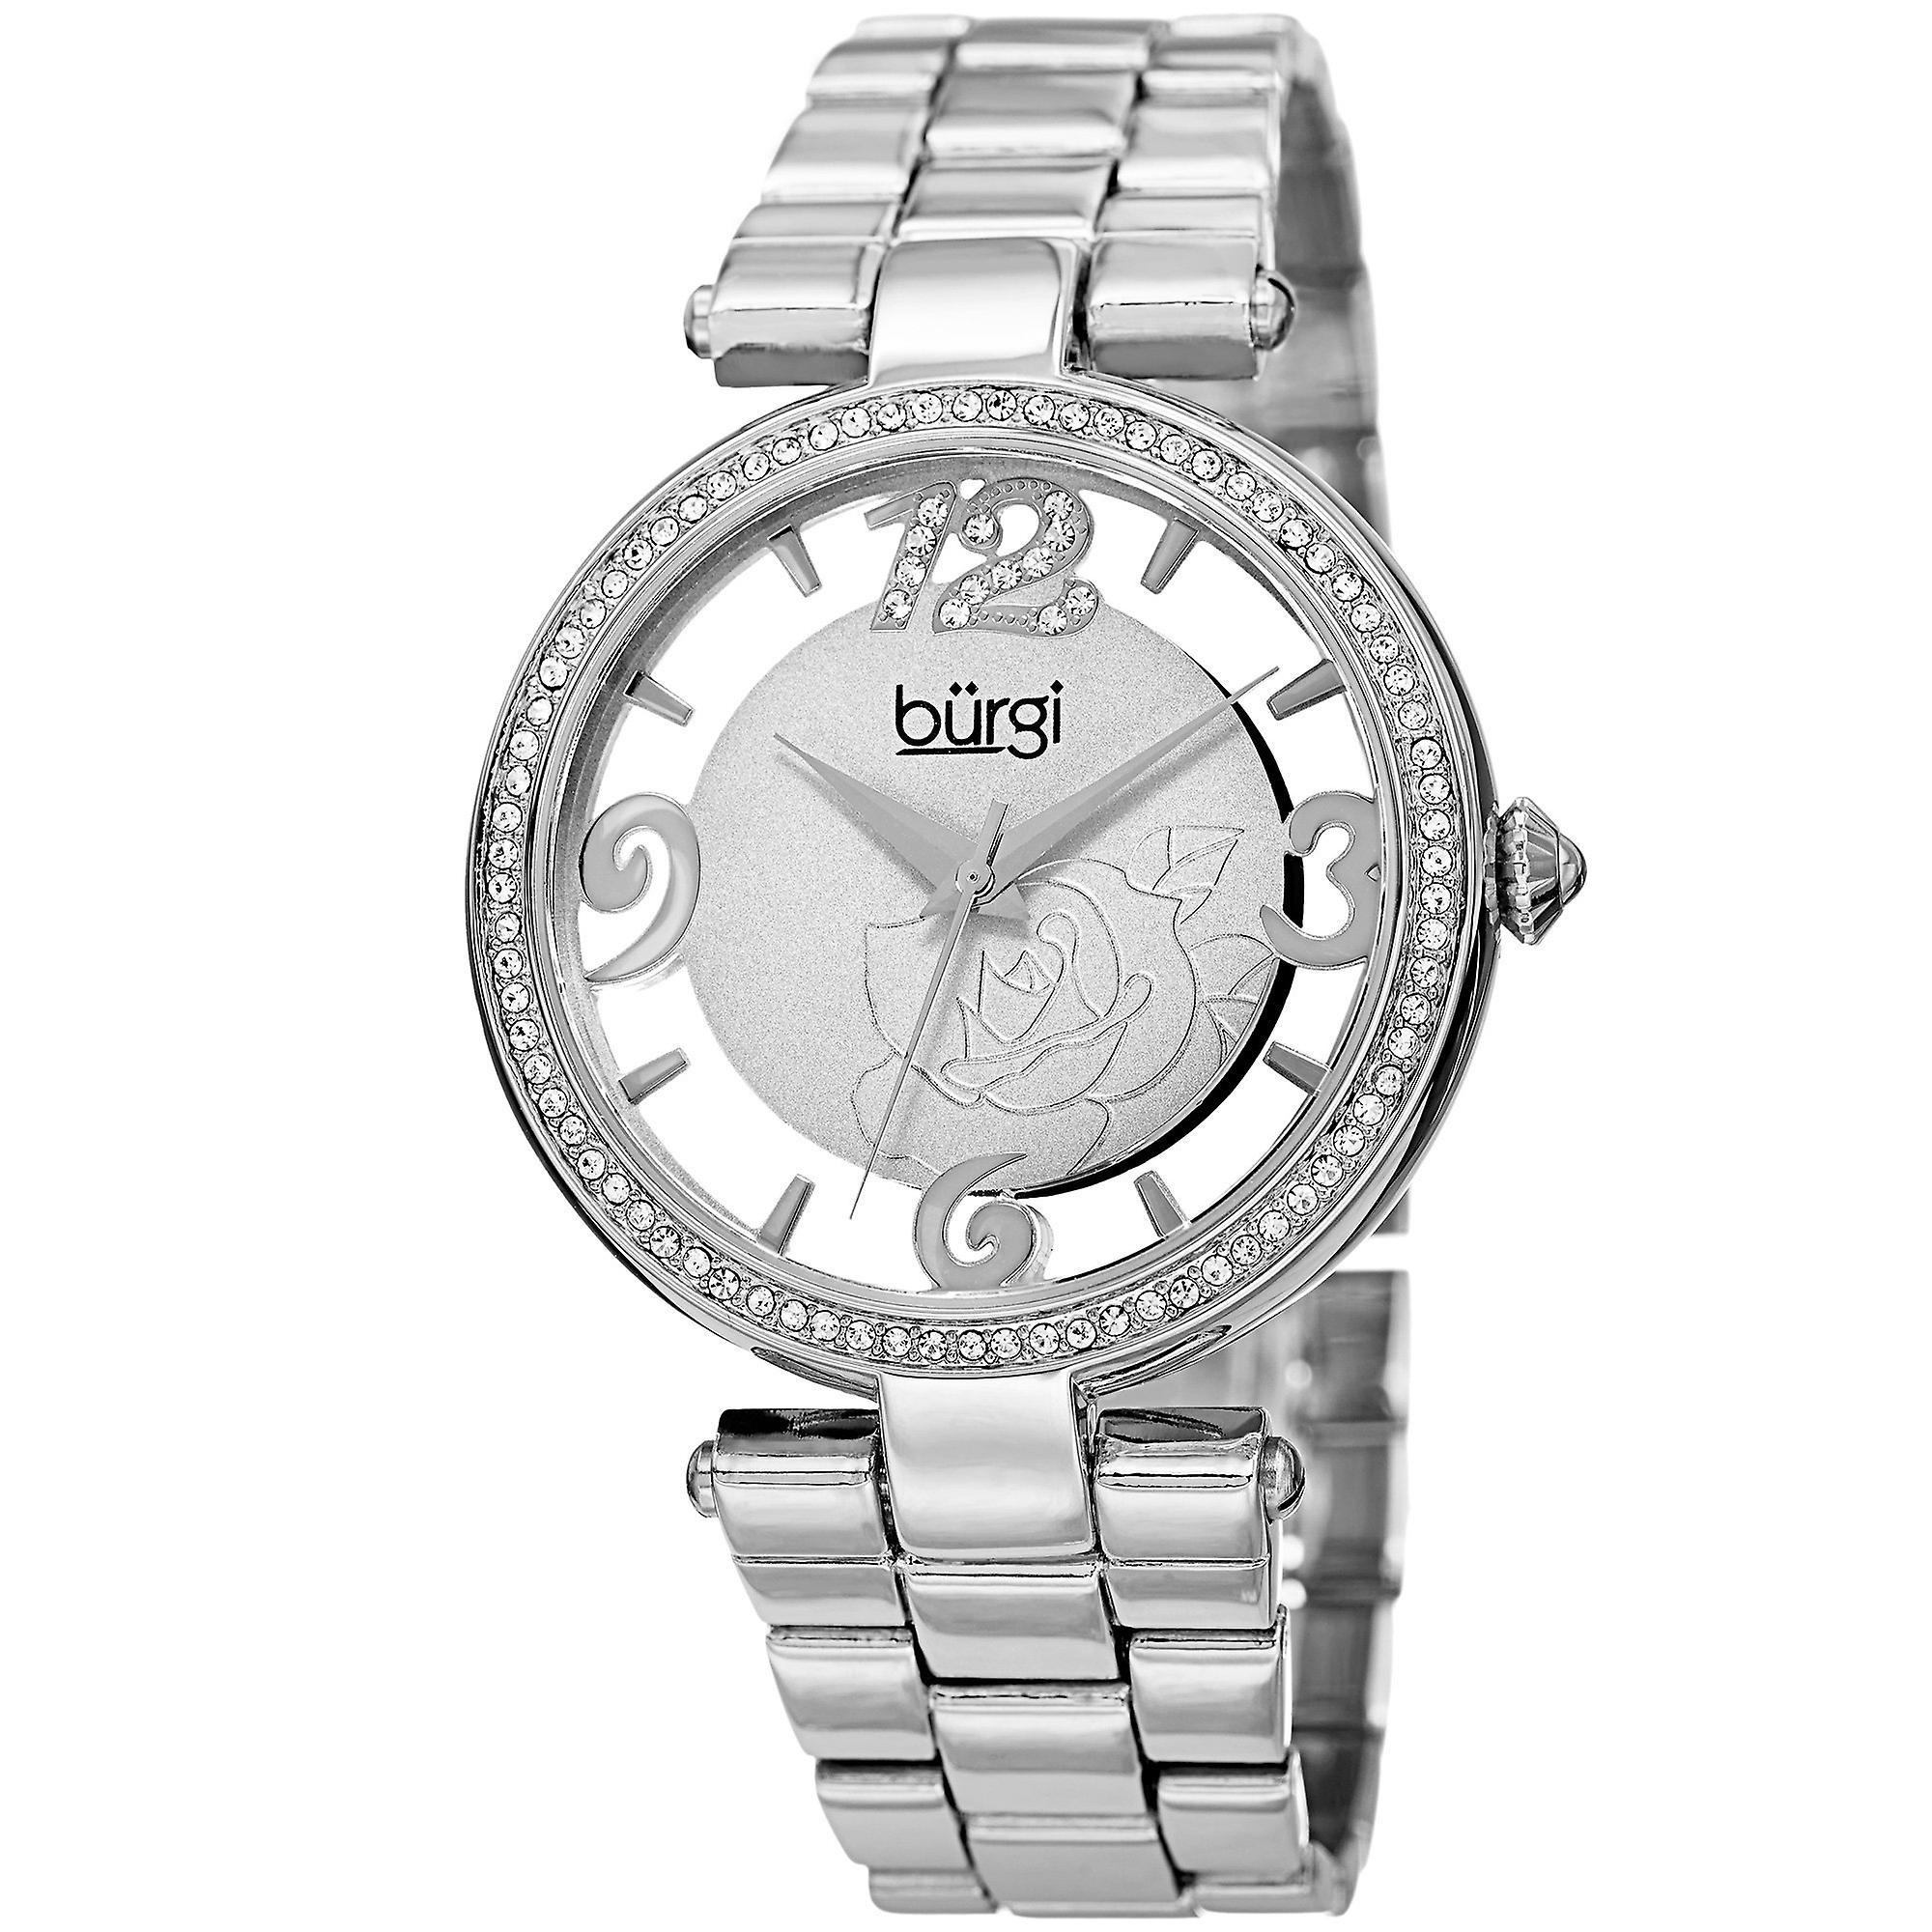 Burgi femmes&s Quartz Swarovski Crystal argent-Tone Bracelet Watch BUR148SS